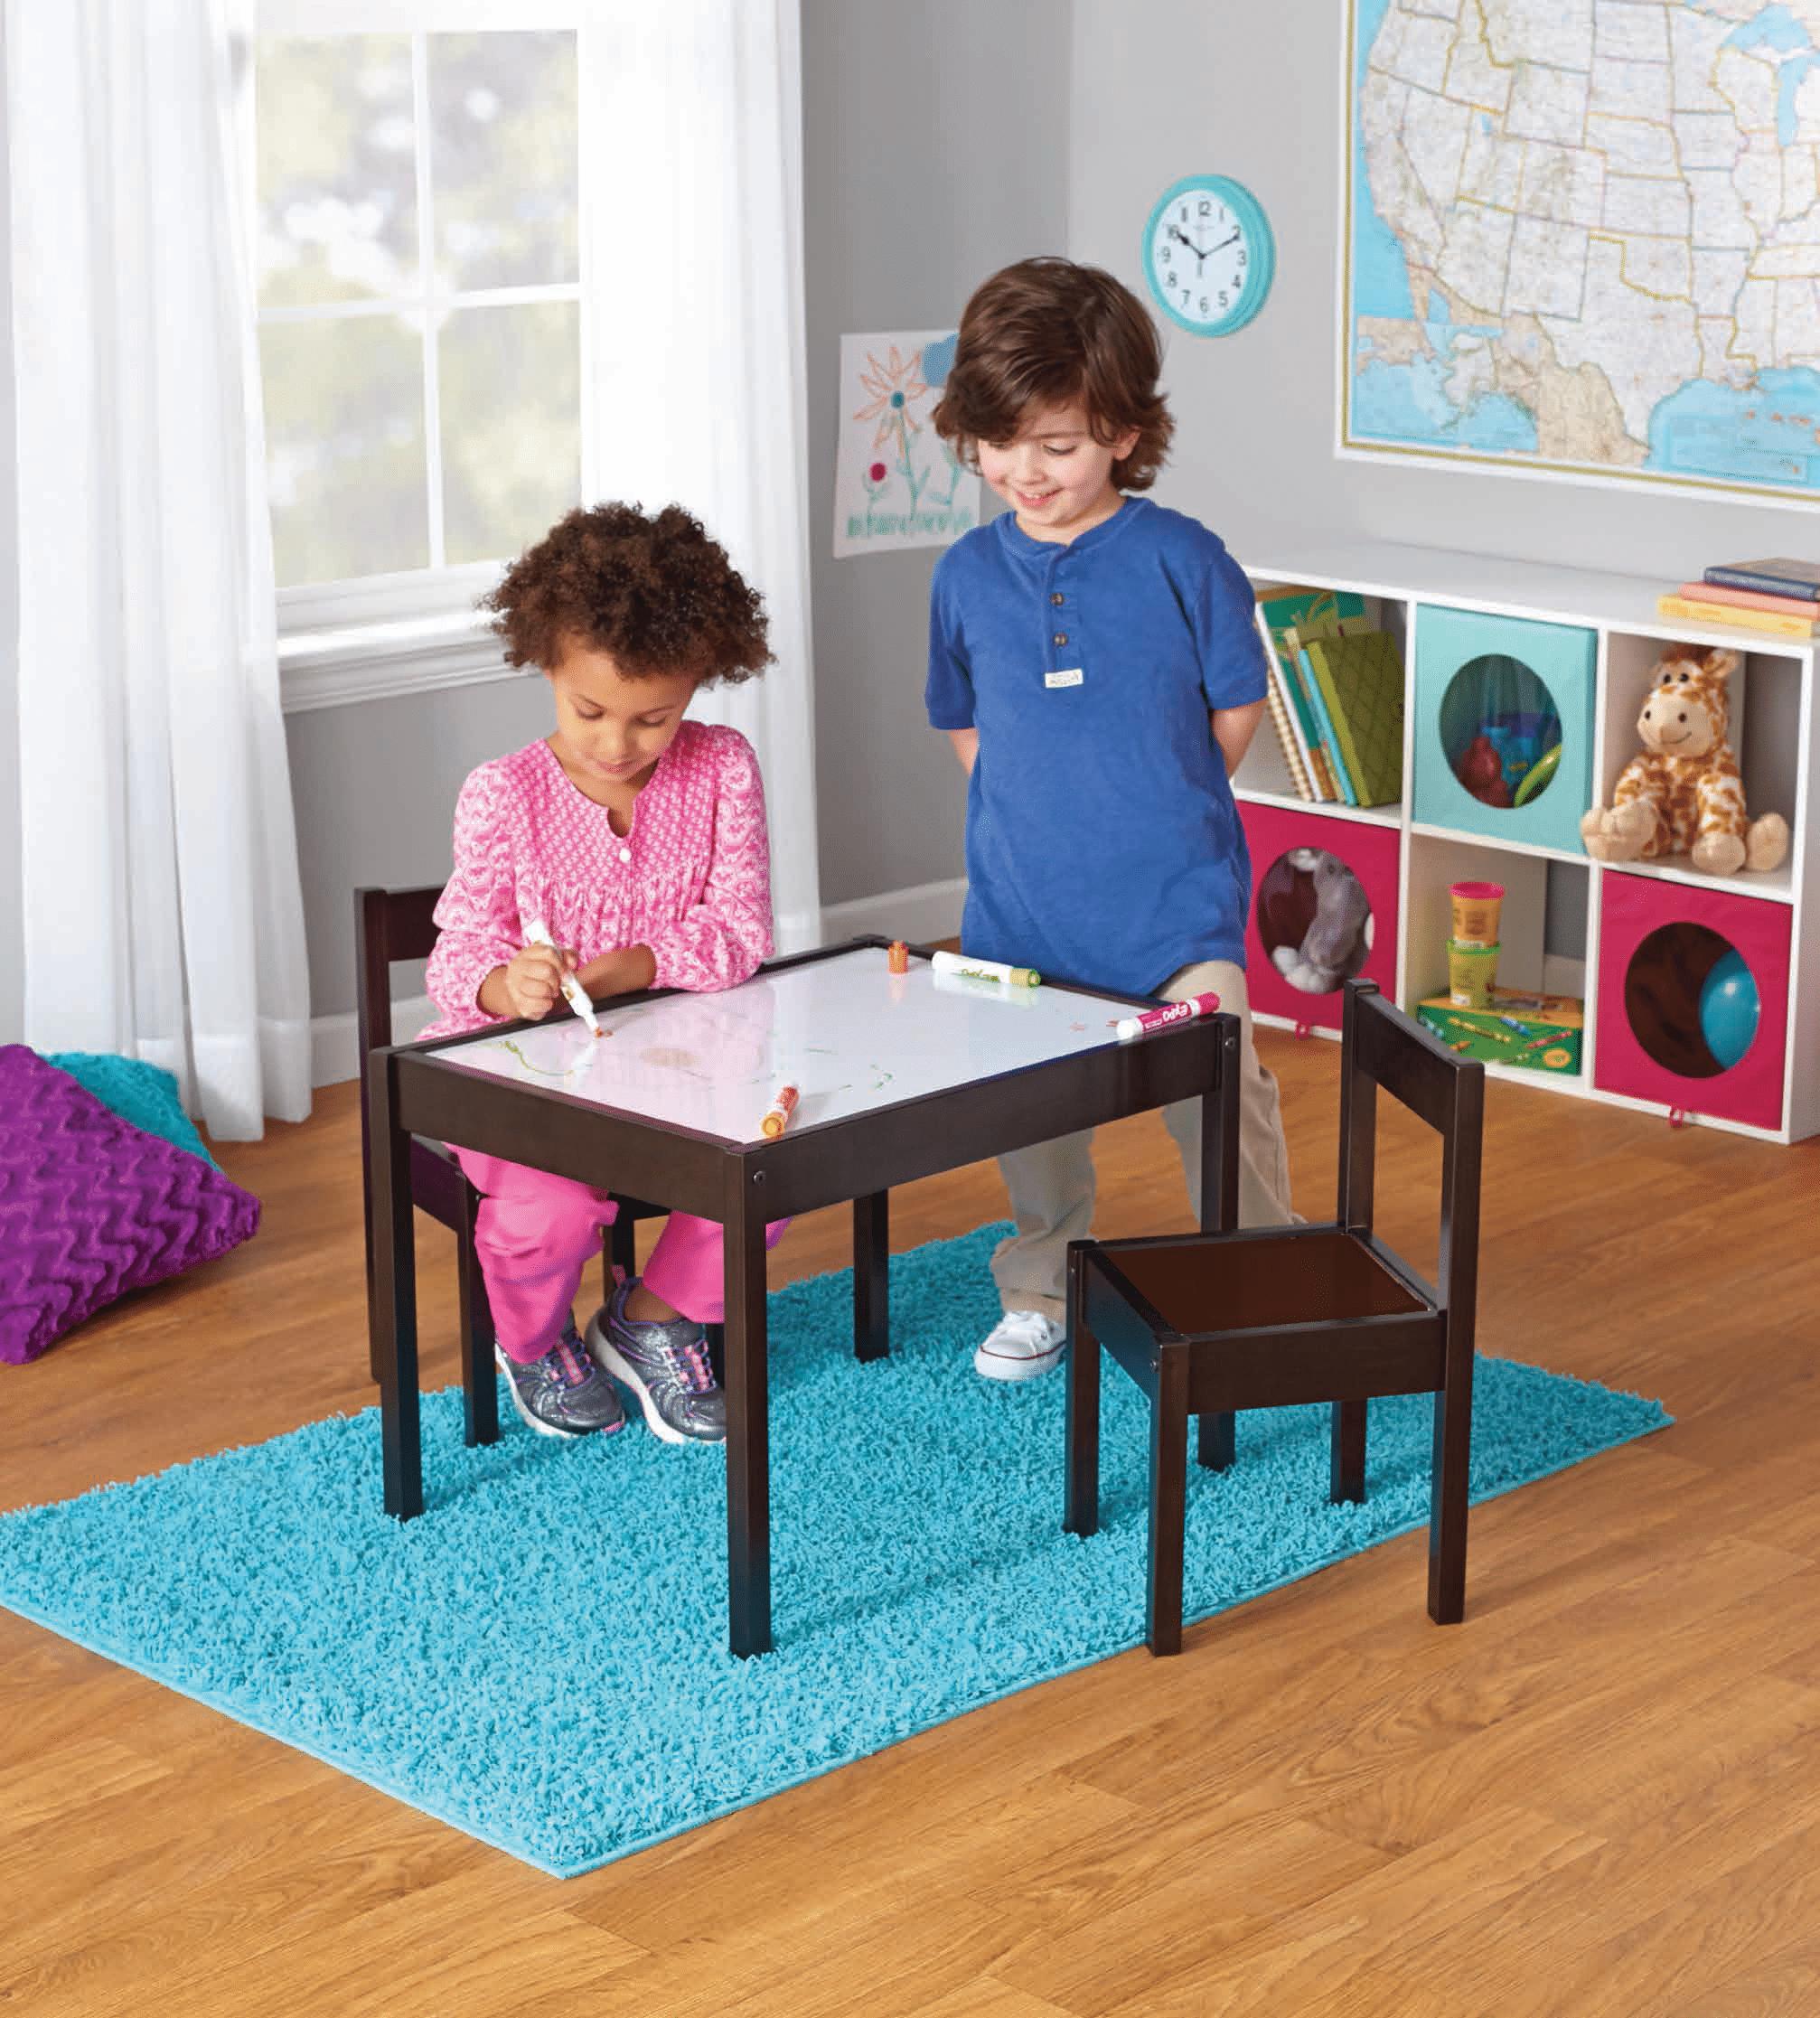 Your Zone 3 Piece Dry Erase Activity Table Play Set Walmart Com Walmart Com